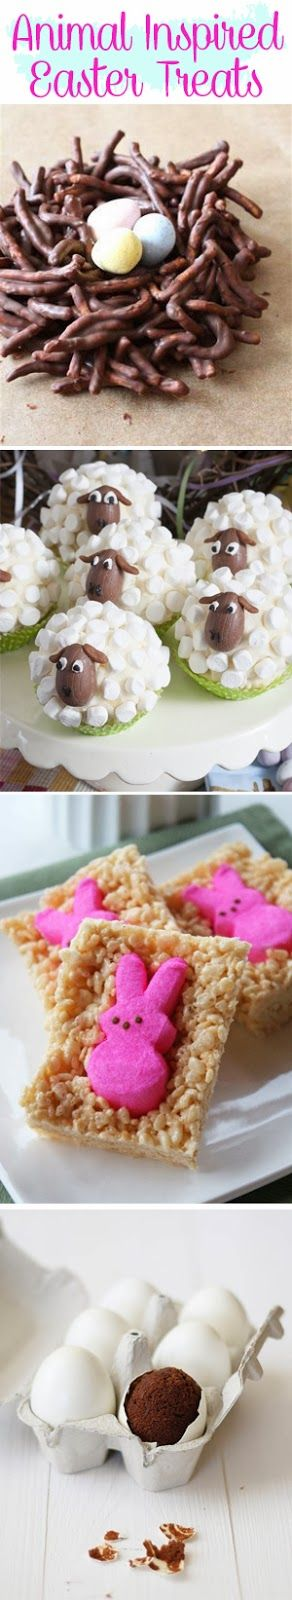 Animal Inspired Easter Treats